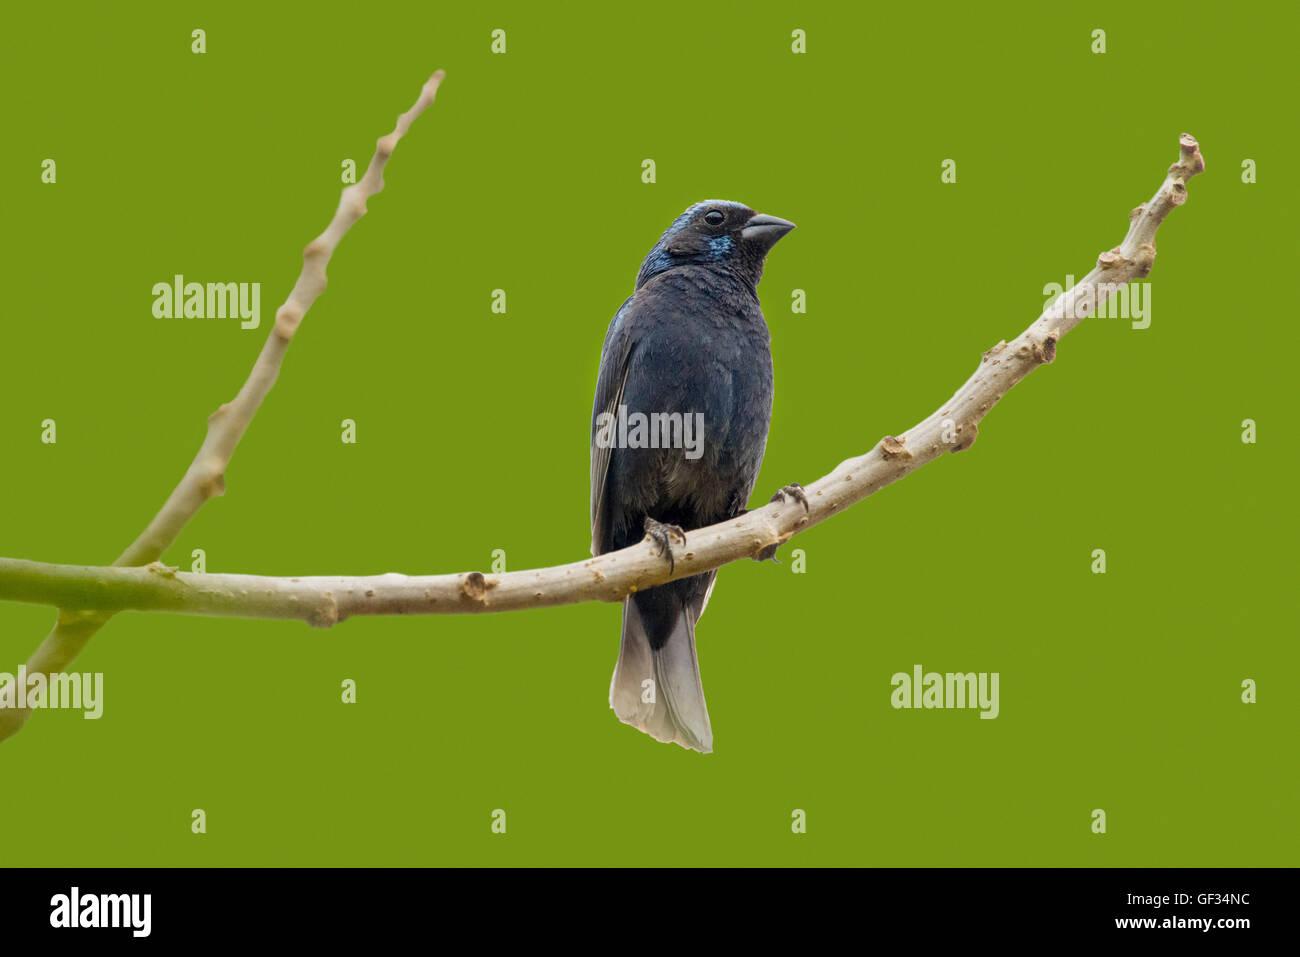 Blue Bunting  Cyanocompsa parellina west of El Tuito, Jalisco, Mexico 13 June      Adult Male      Cardinalidae - Stock Image